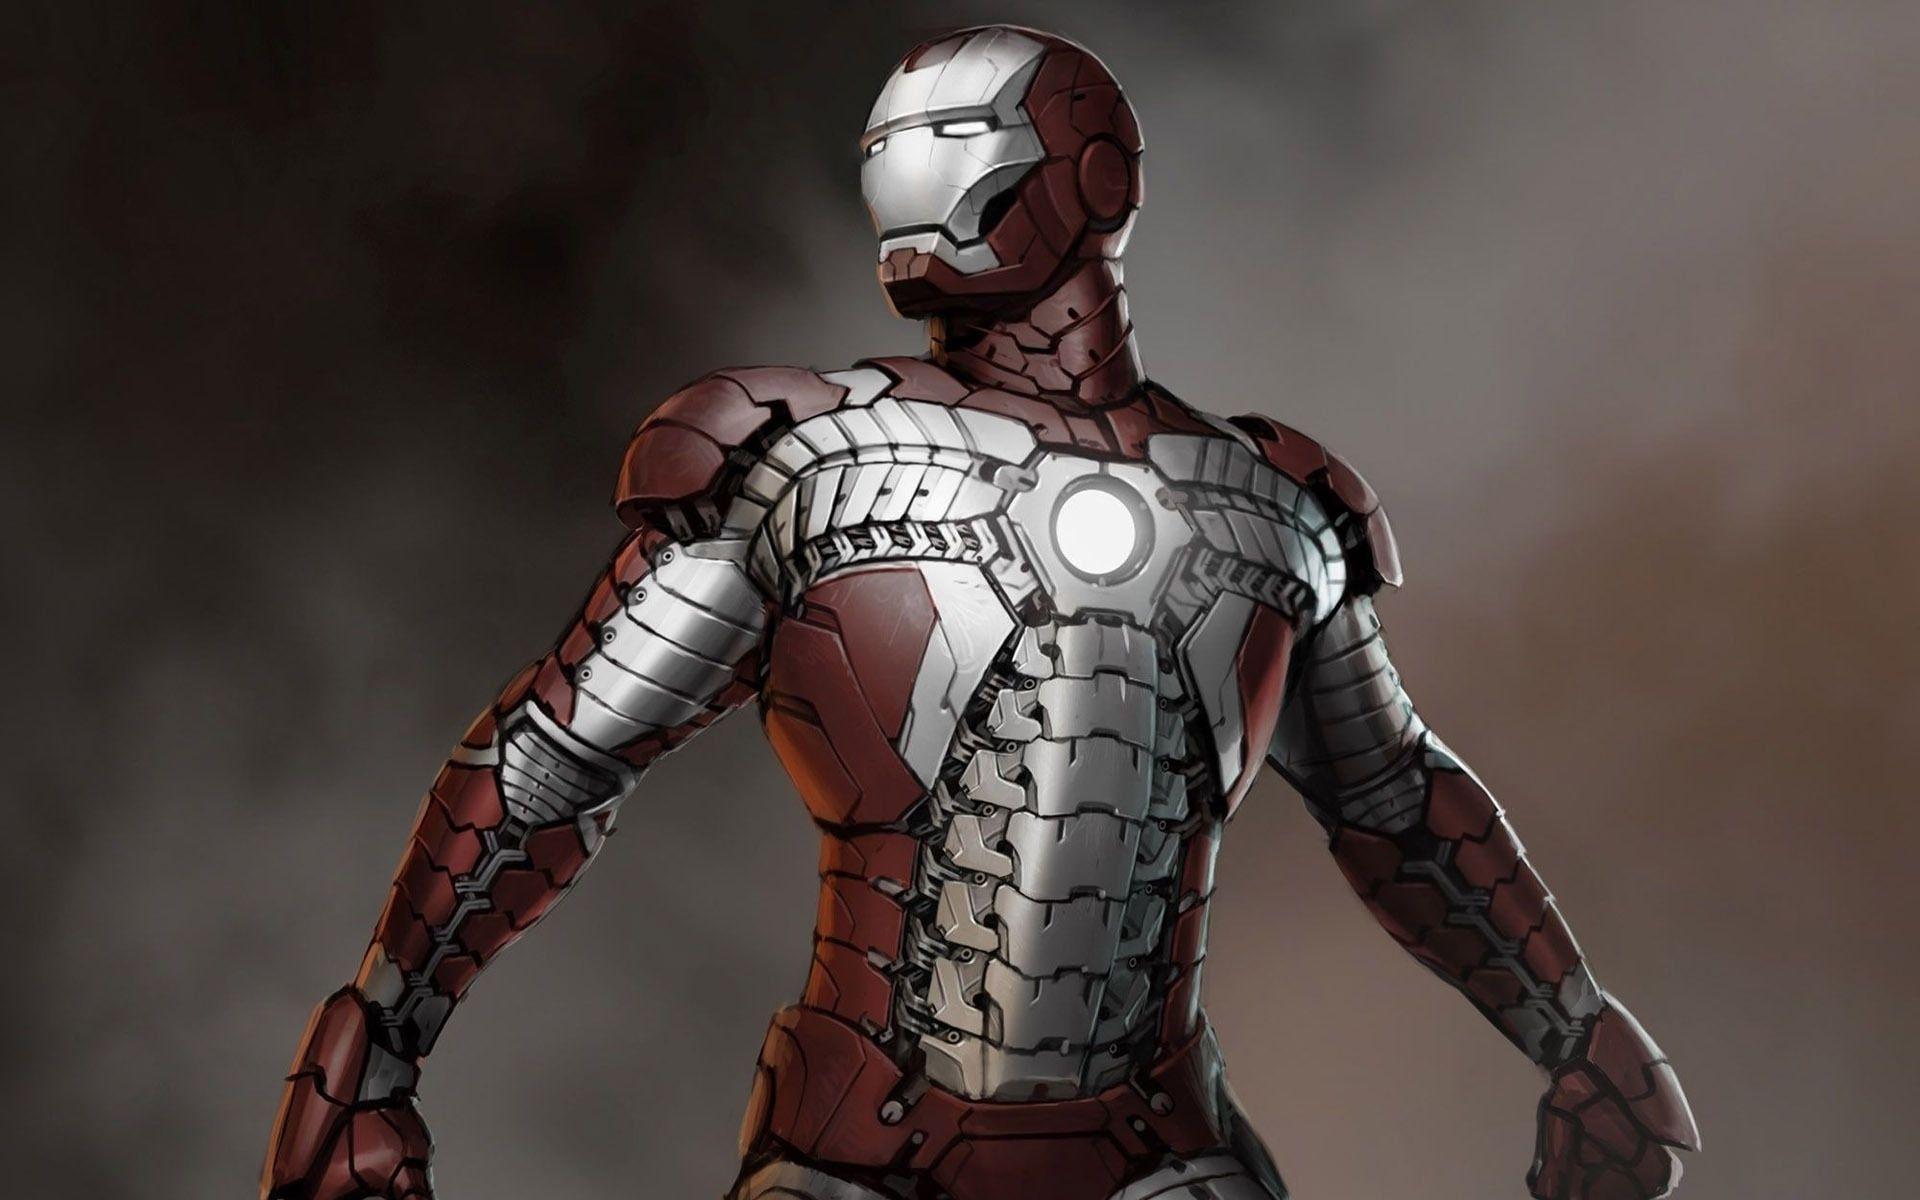 Iron Man Wallpapers HD - Wallpaper Cave  Iron Man Wallpa...